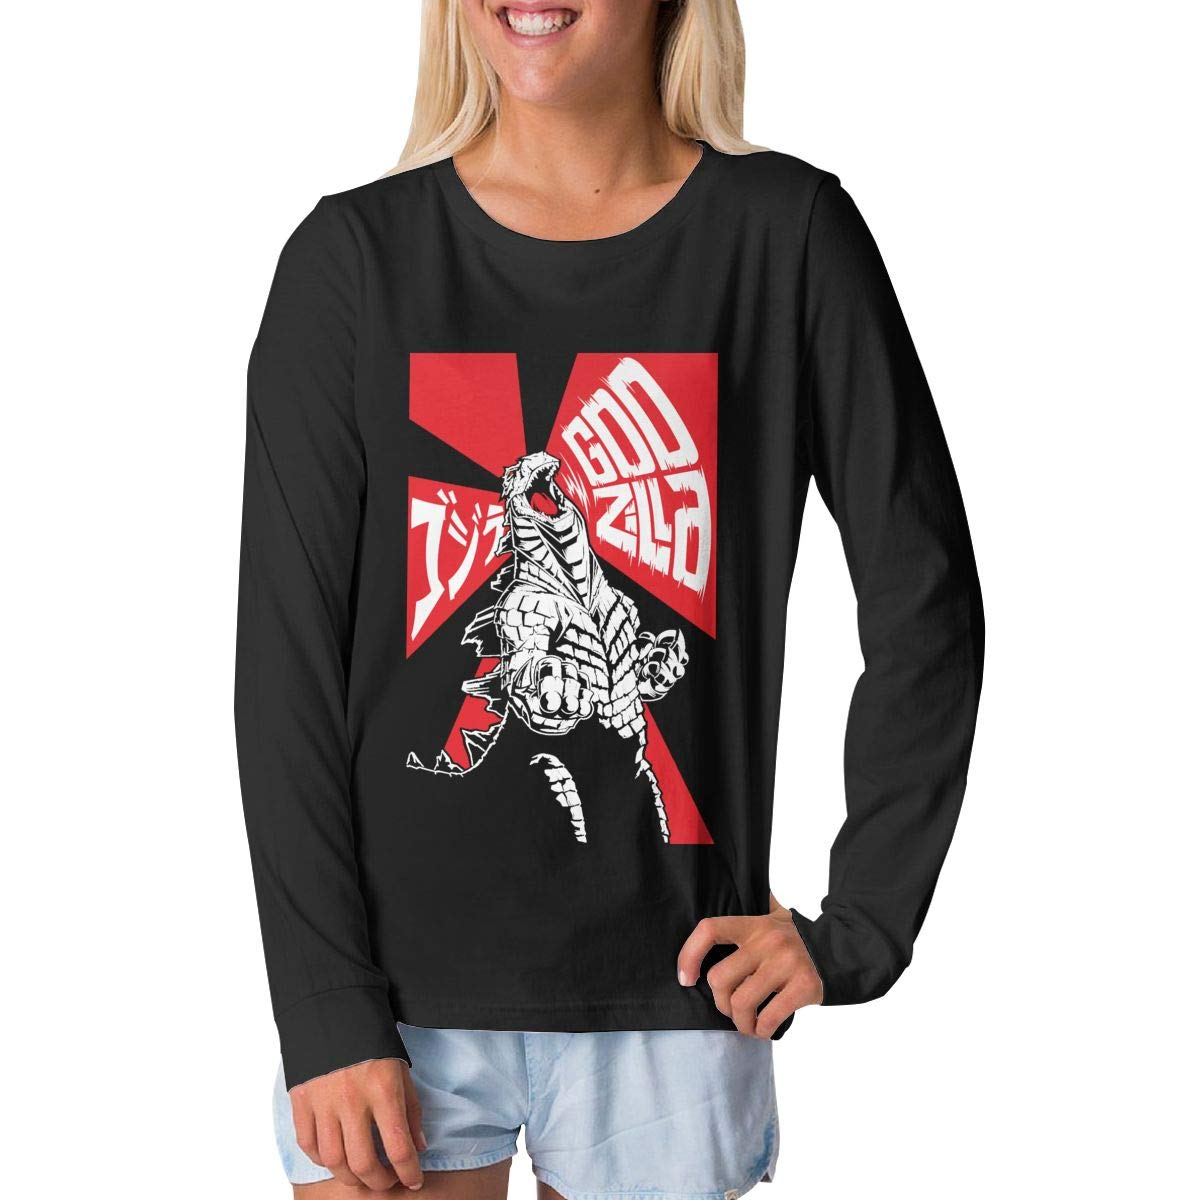 BilliePhillips Adolescent Godzilla Leisure Long Sleeve T Shirts